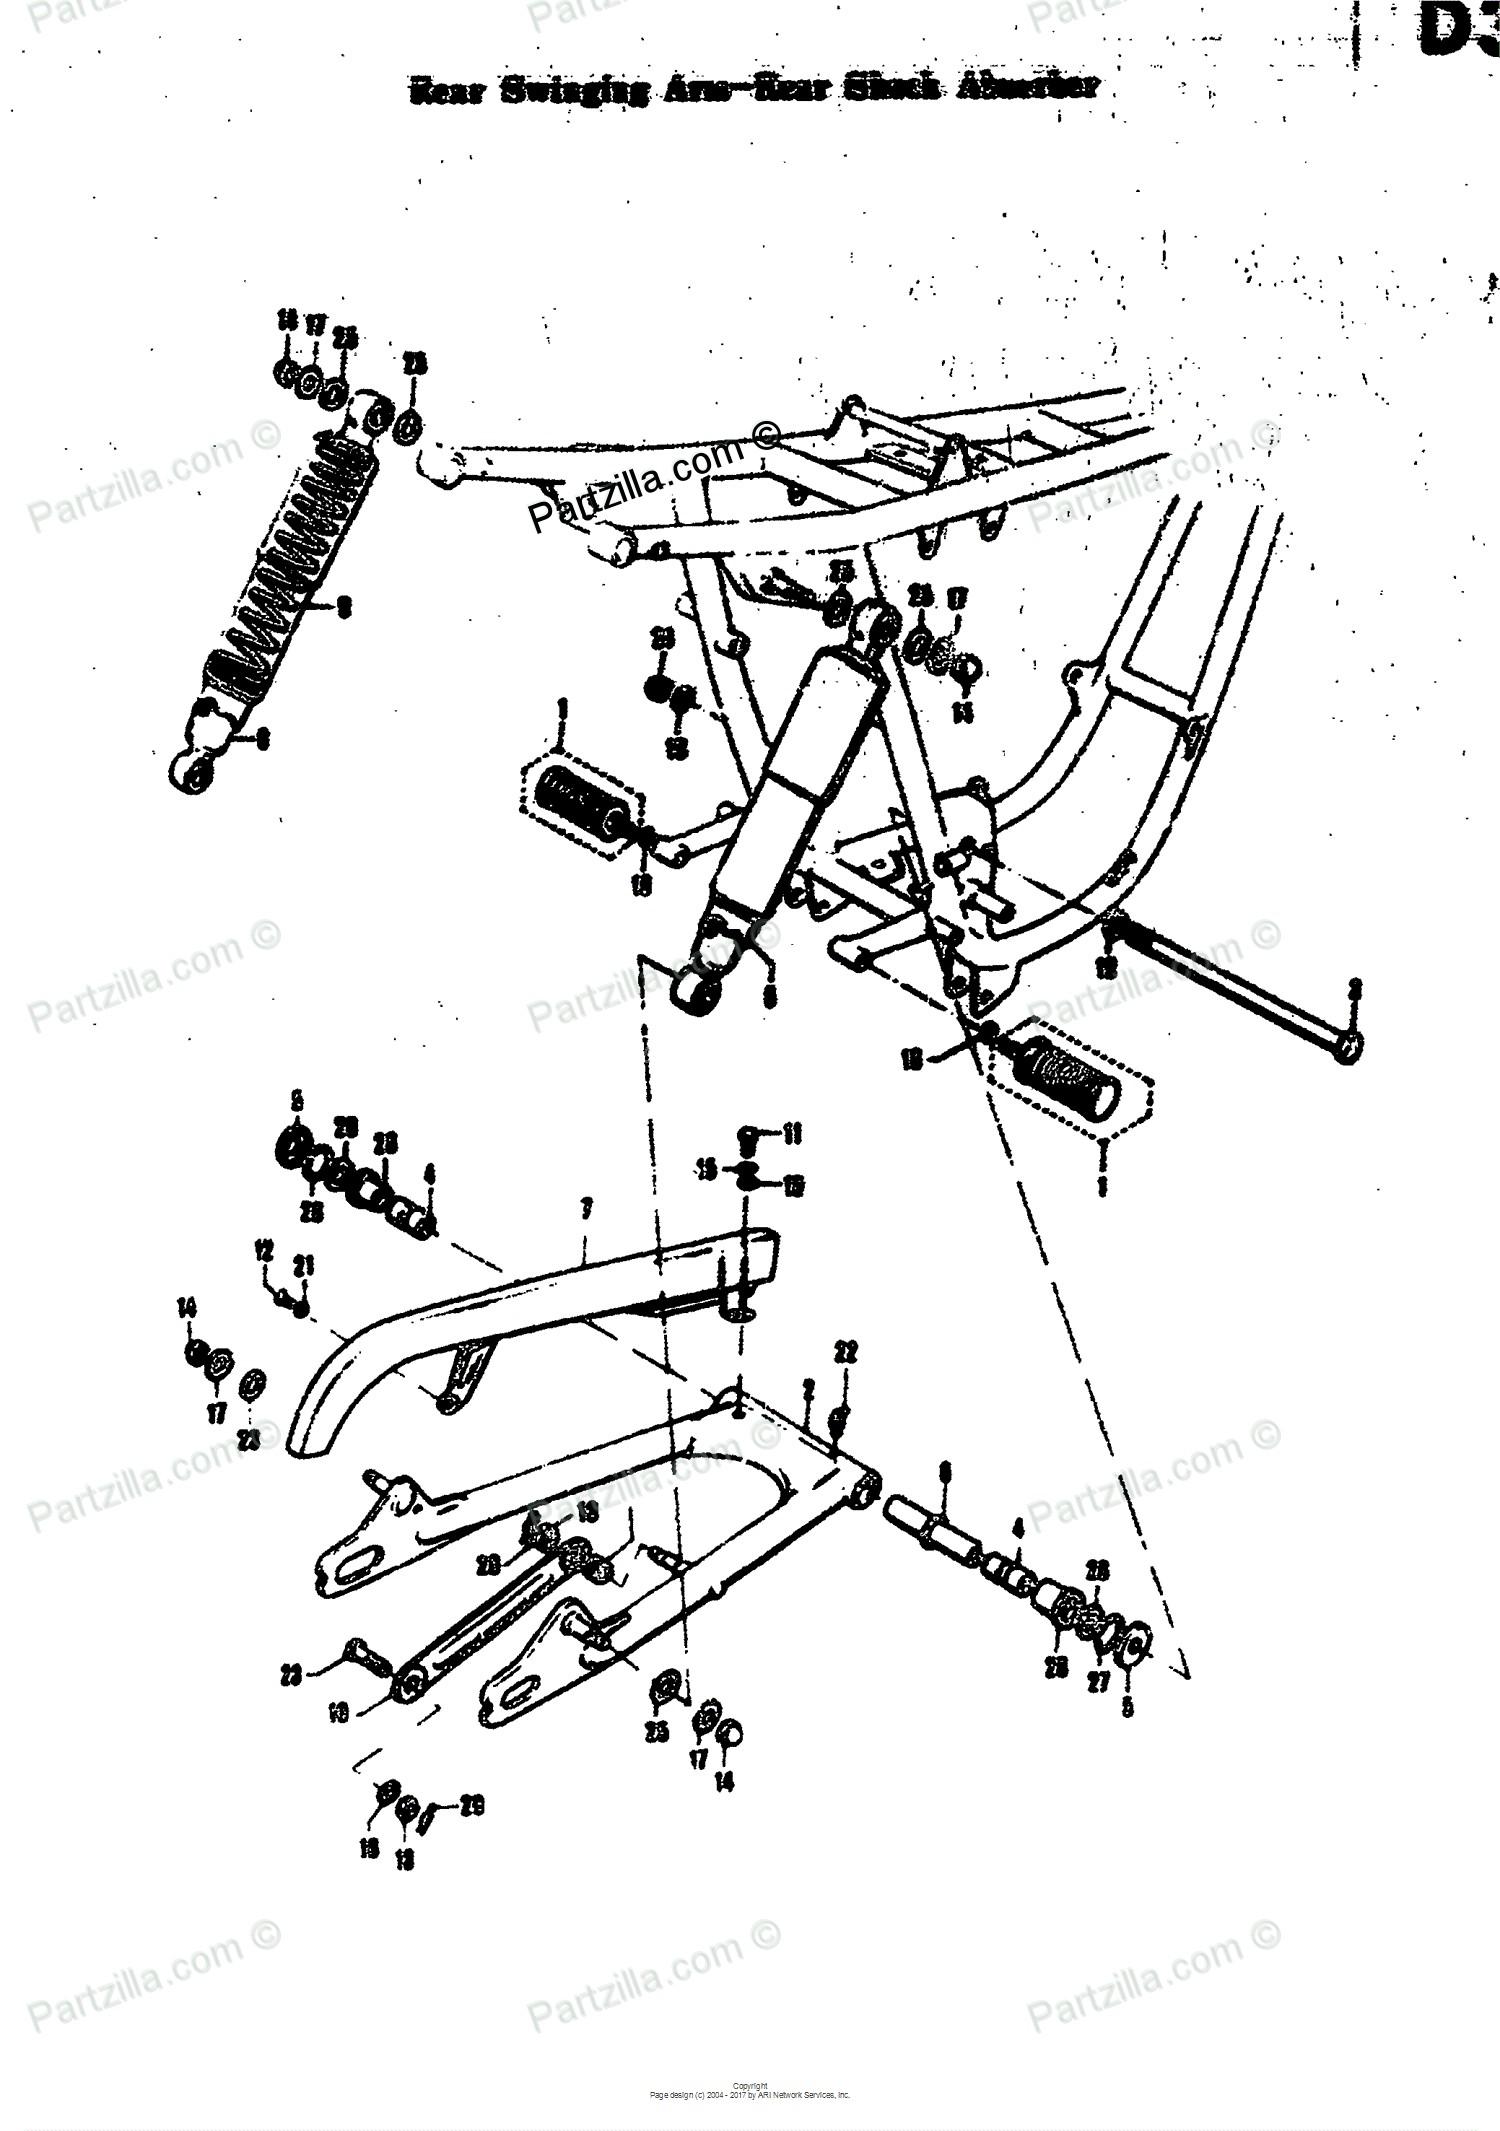 Car Shock Absorber Diagram Suzuki Motorcycle 1969 Oem Parts Diagram for Rear Swinging Arm Rear Of Car Shock Absorber Diagram